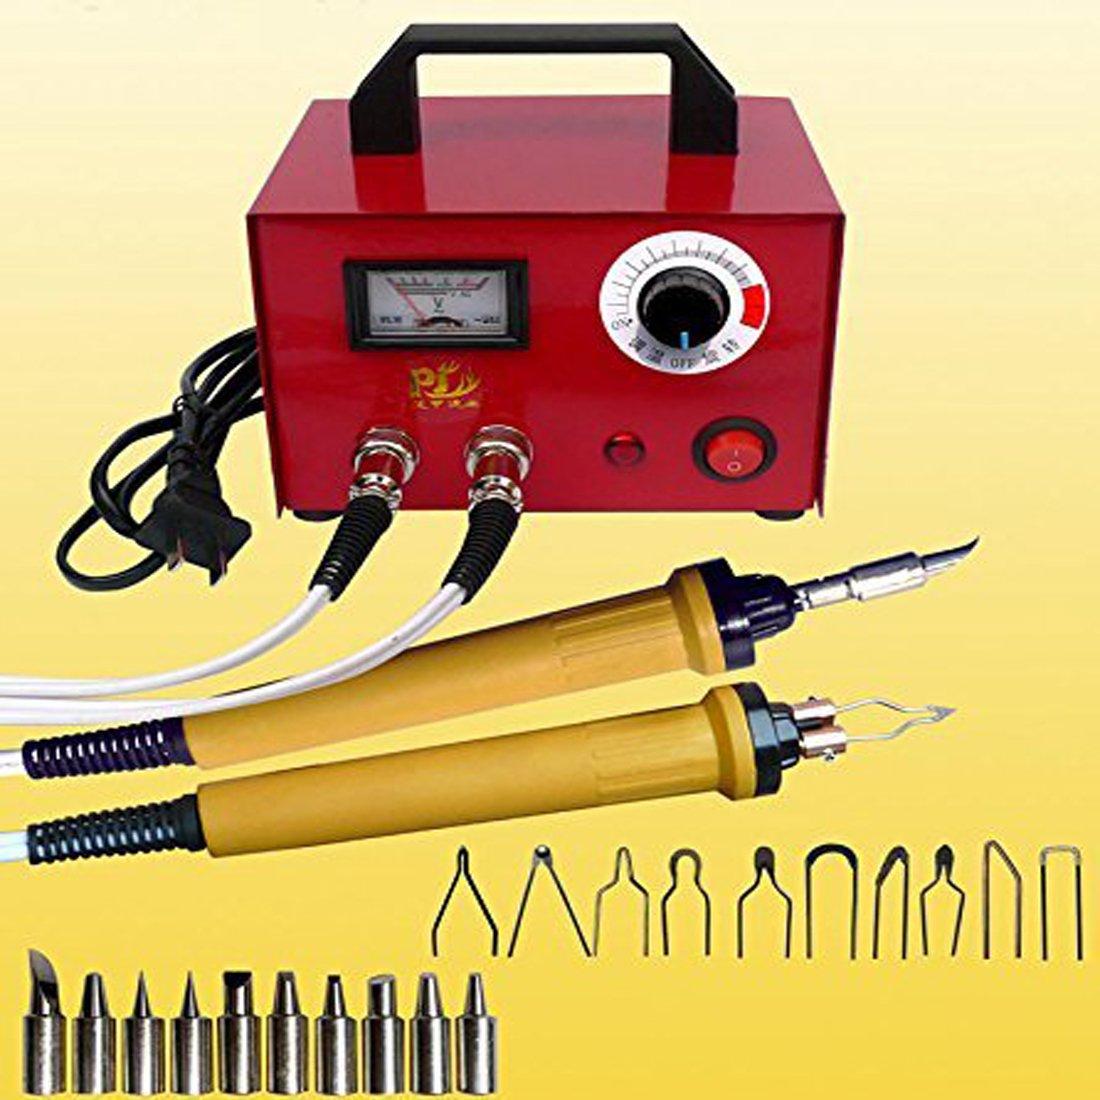 100W 110V Multifunction Wood Burning Tool Pyrography Machine Portable - 20Pcs Wire Dual Pen Wood Pyrography Crafts Kit